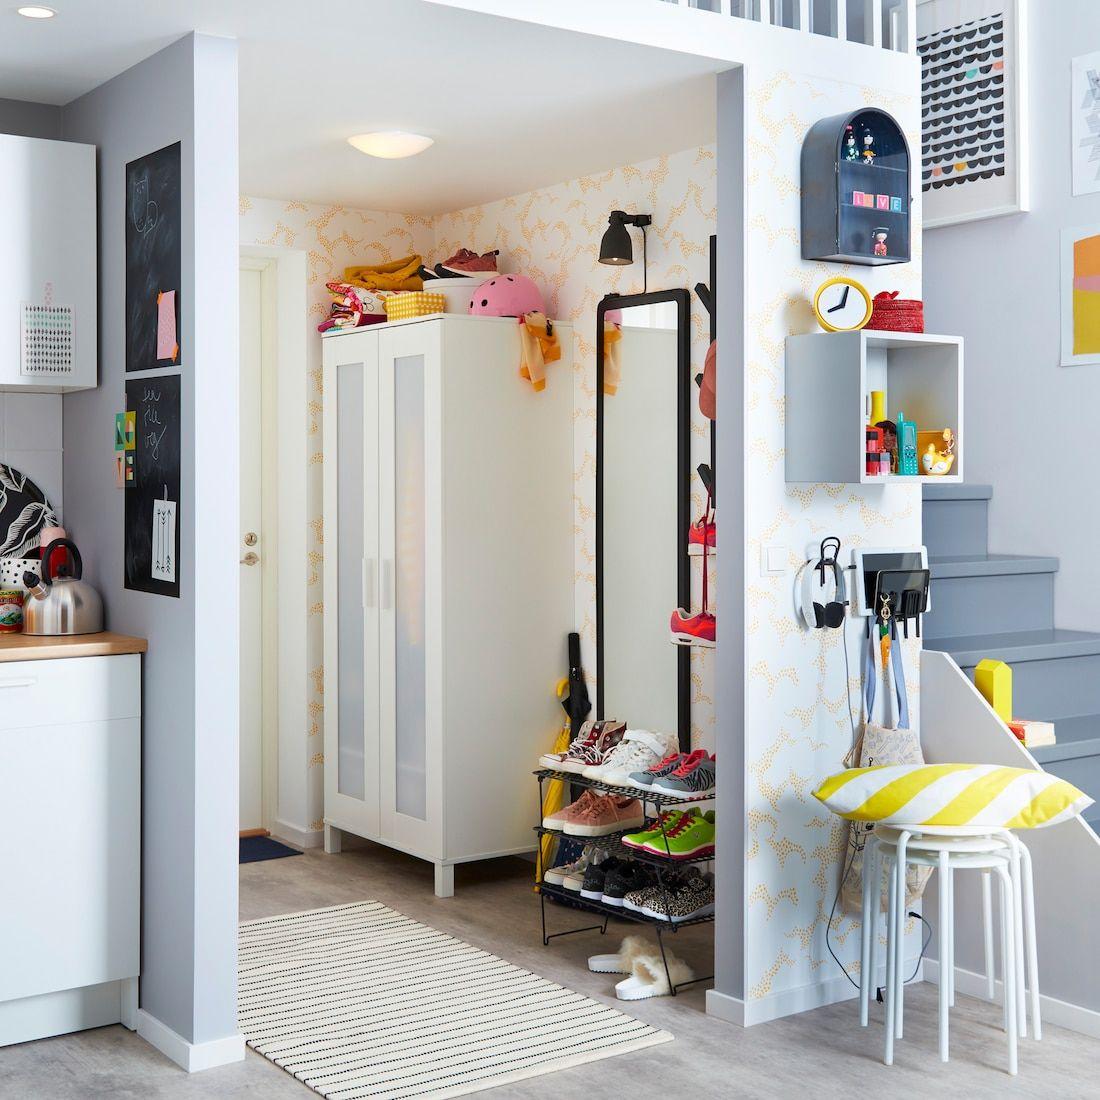 Deco Entree Notre Galerie De Photos Salon En 2020 Couloir Ikea